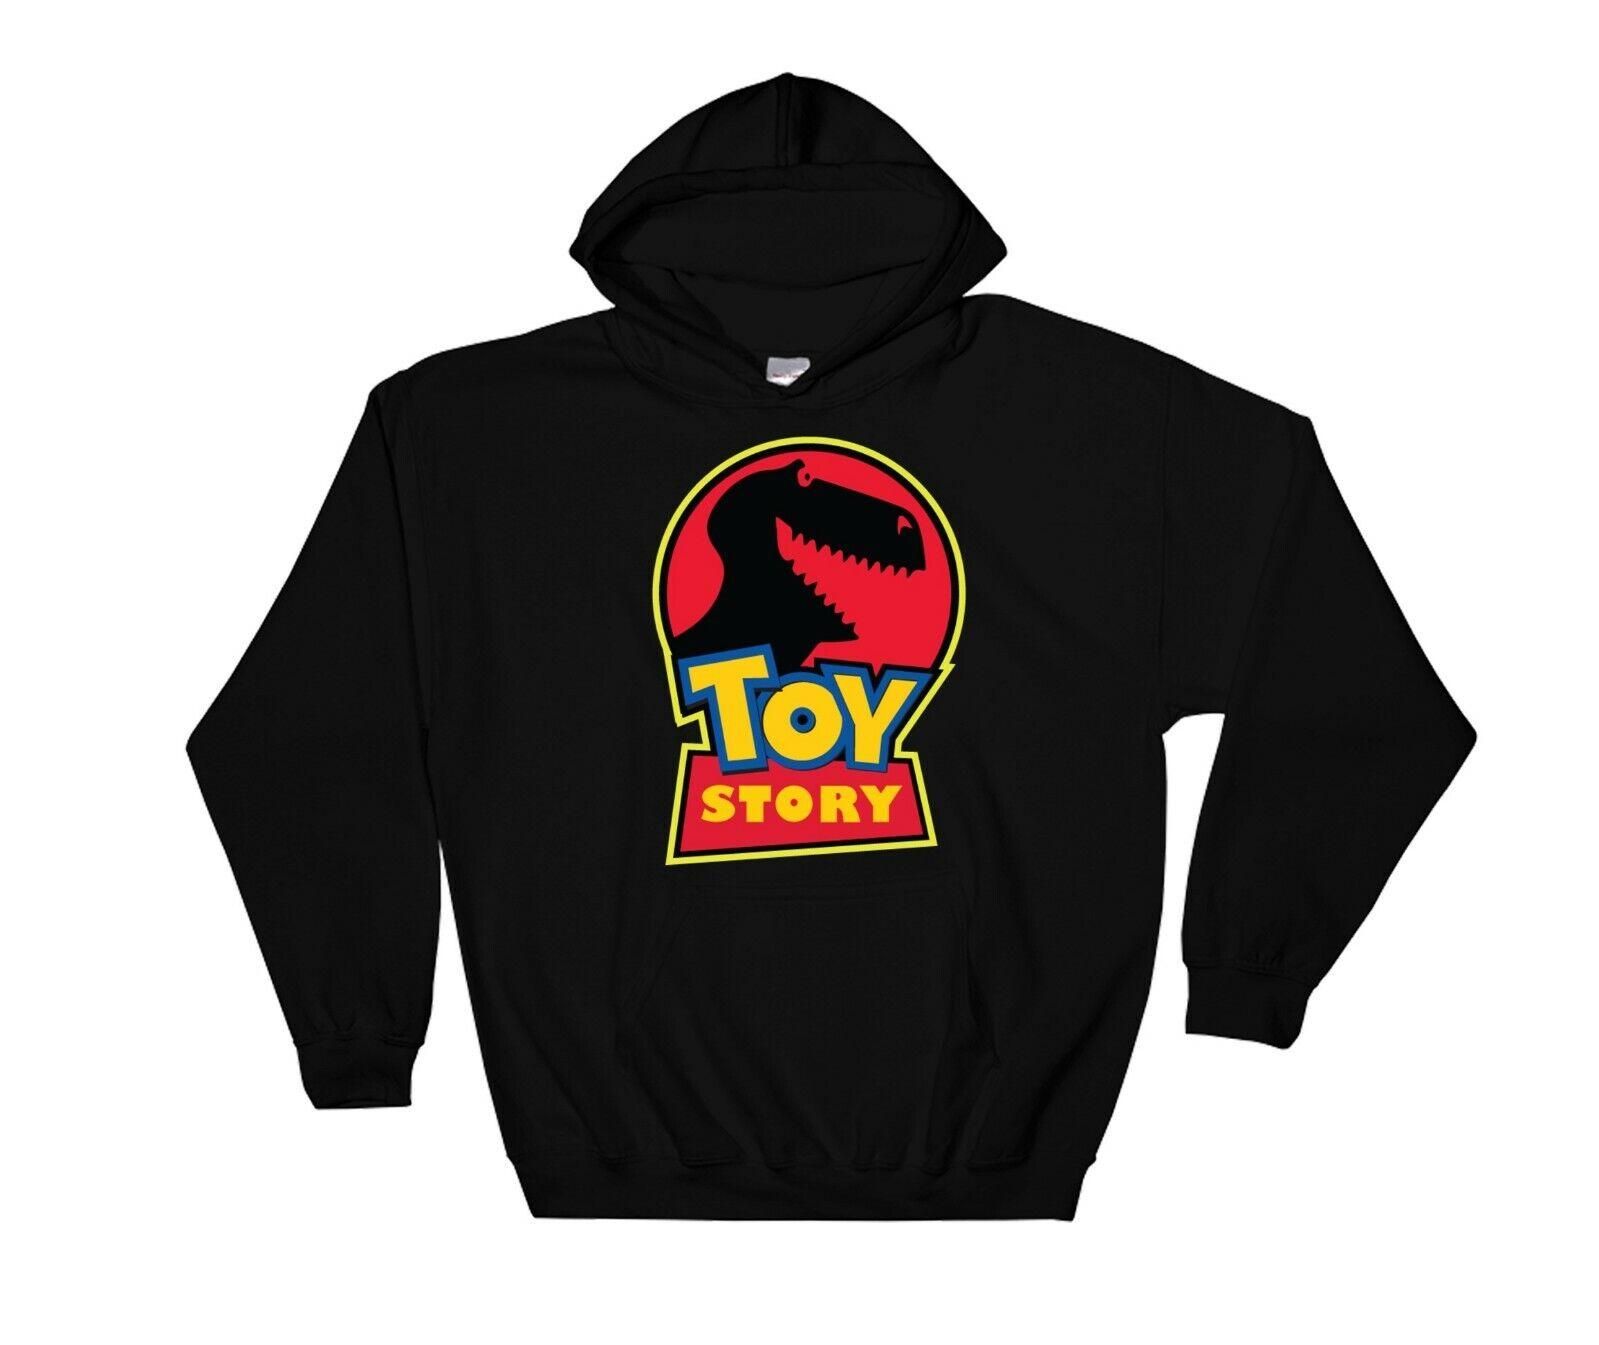 Toy Story Rex Hoodie Novelty Cool Gift Sweatshirt Jumper Pullover 4189